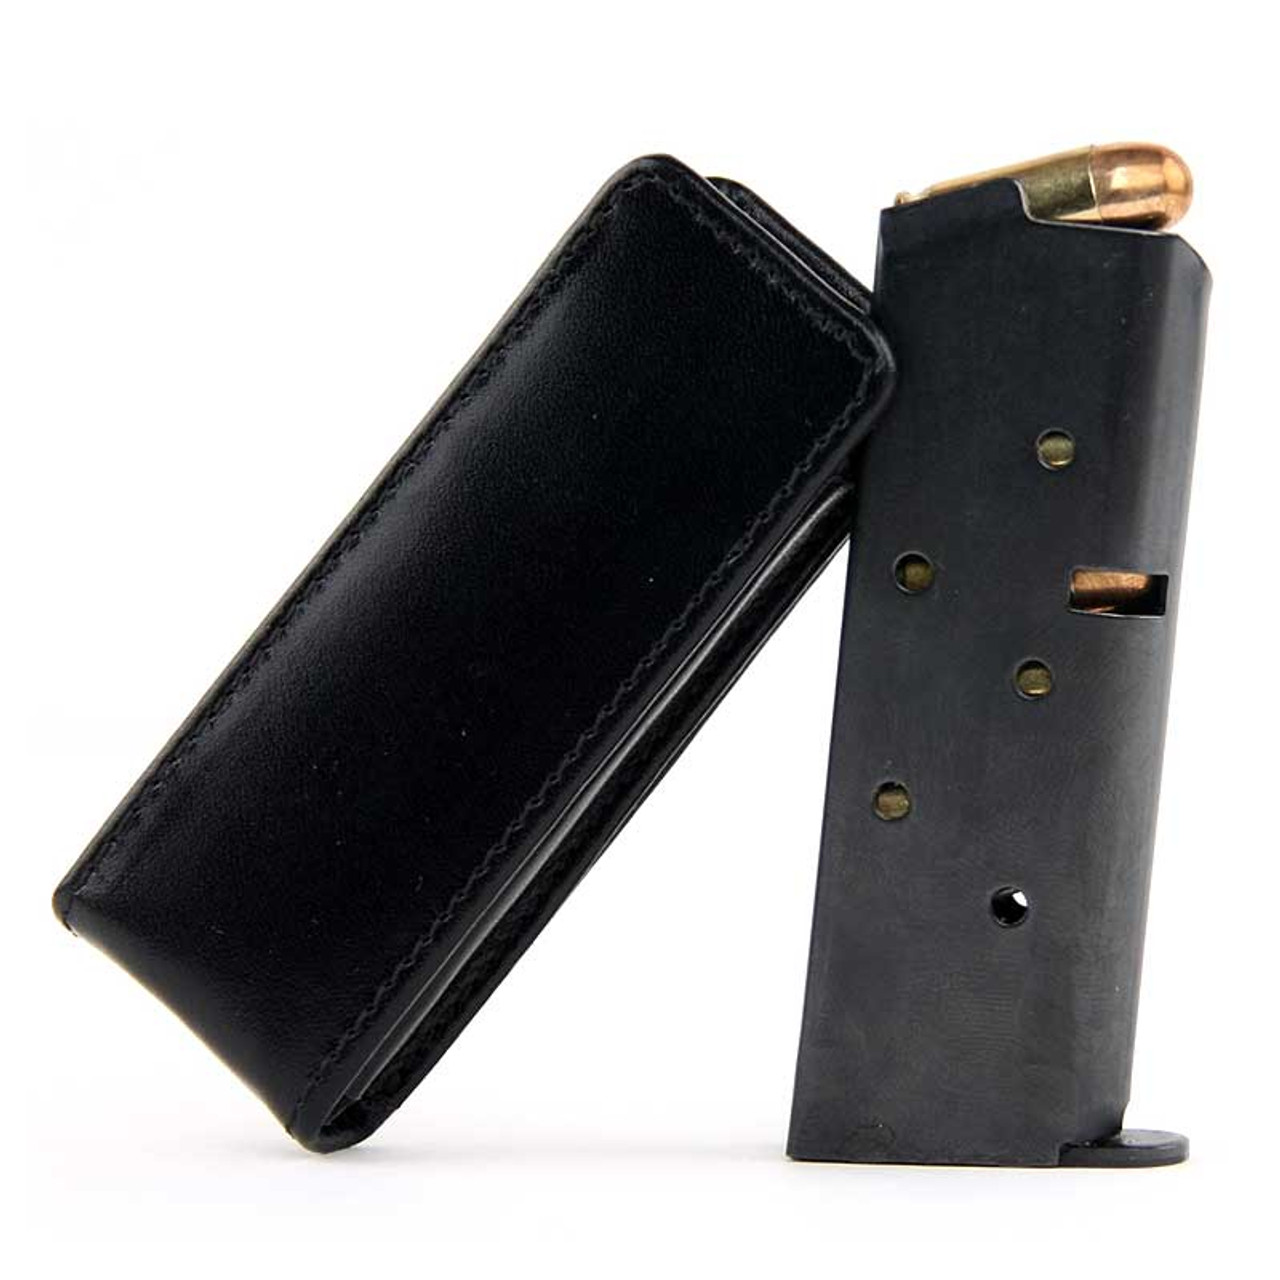 Kahr P9 Magazine Pocket Protector